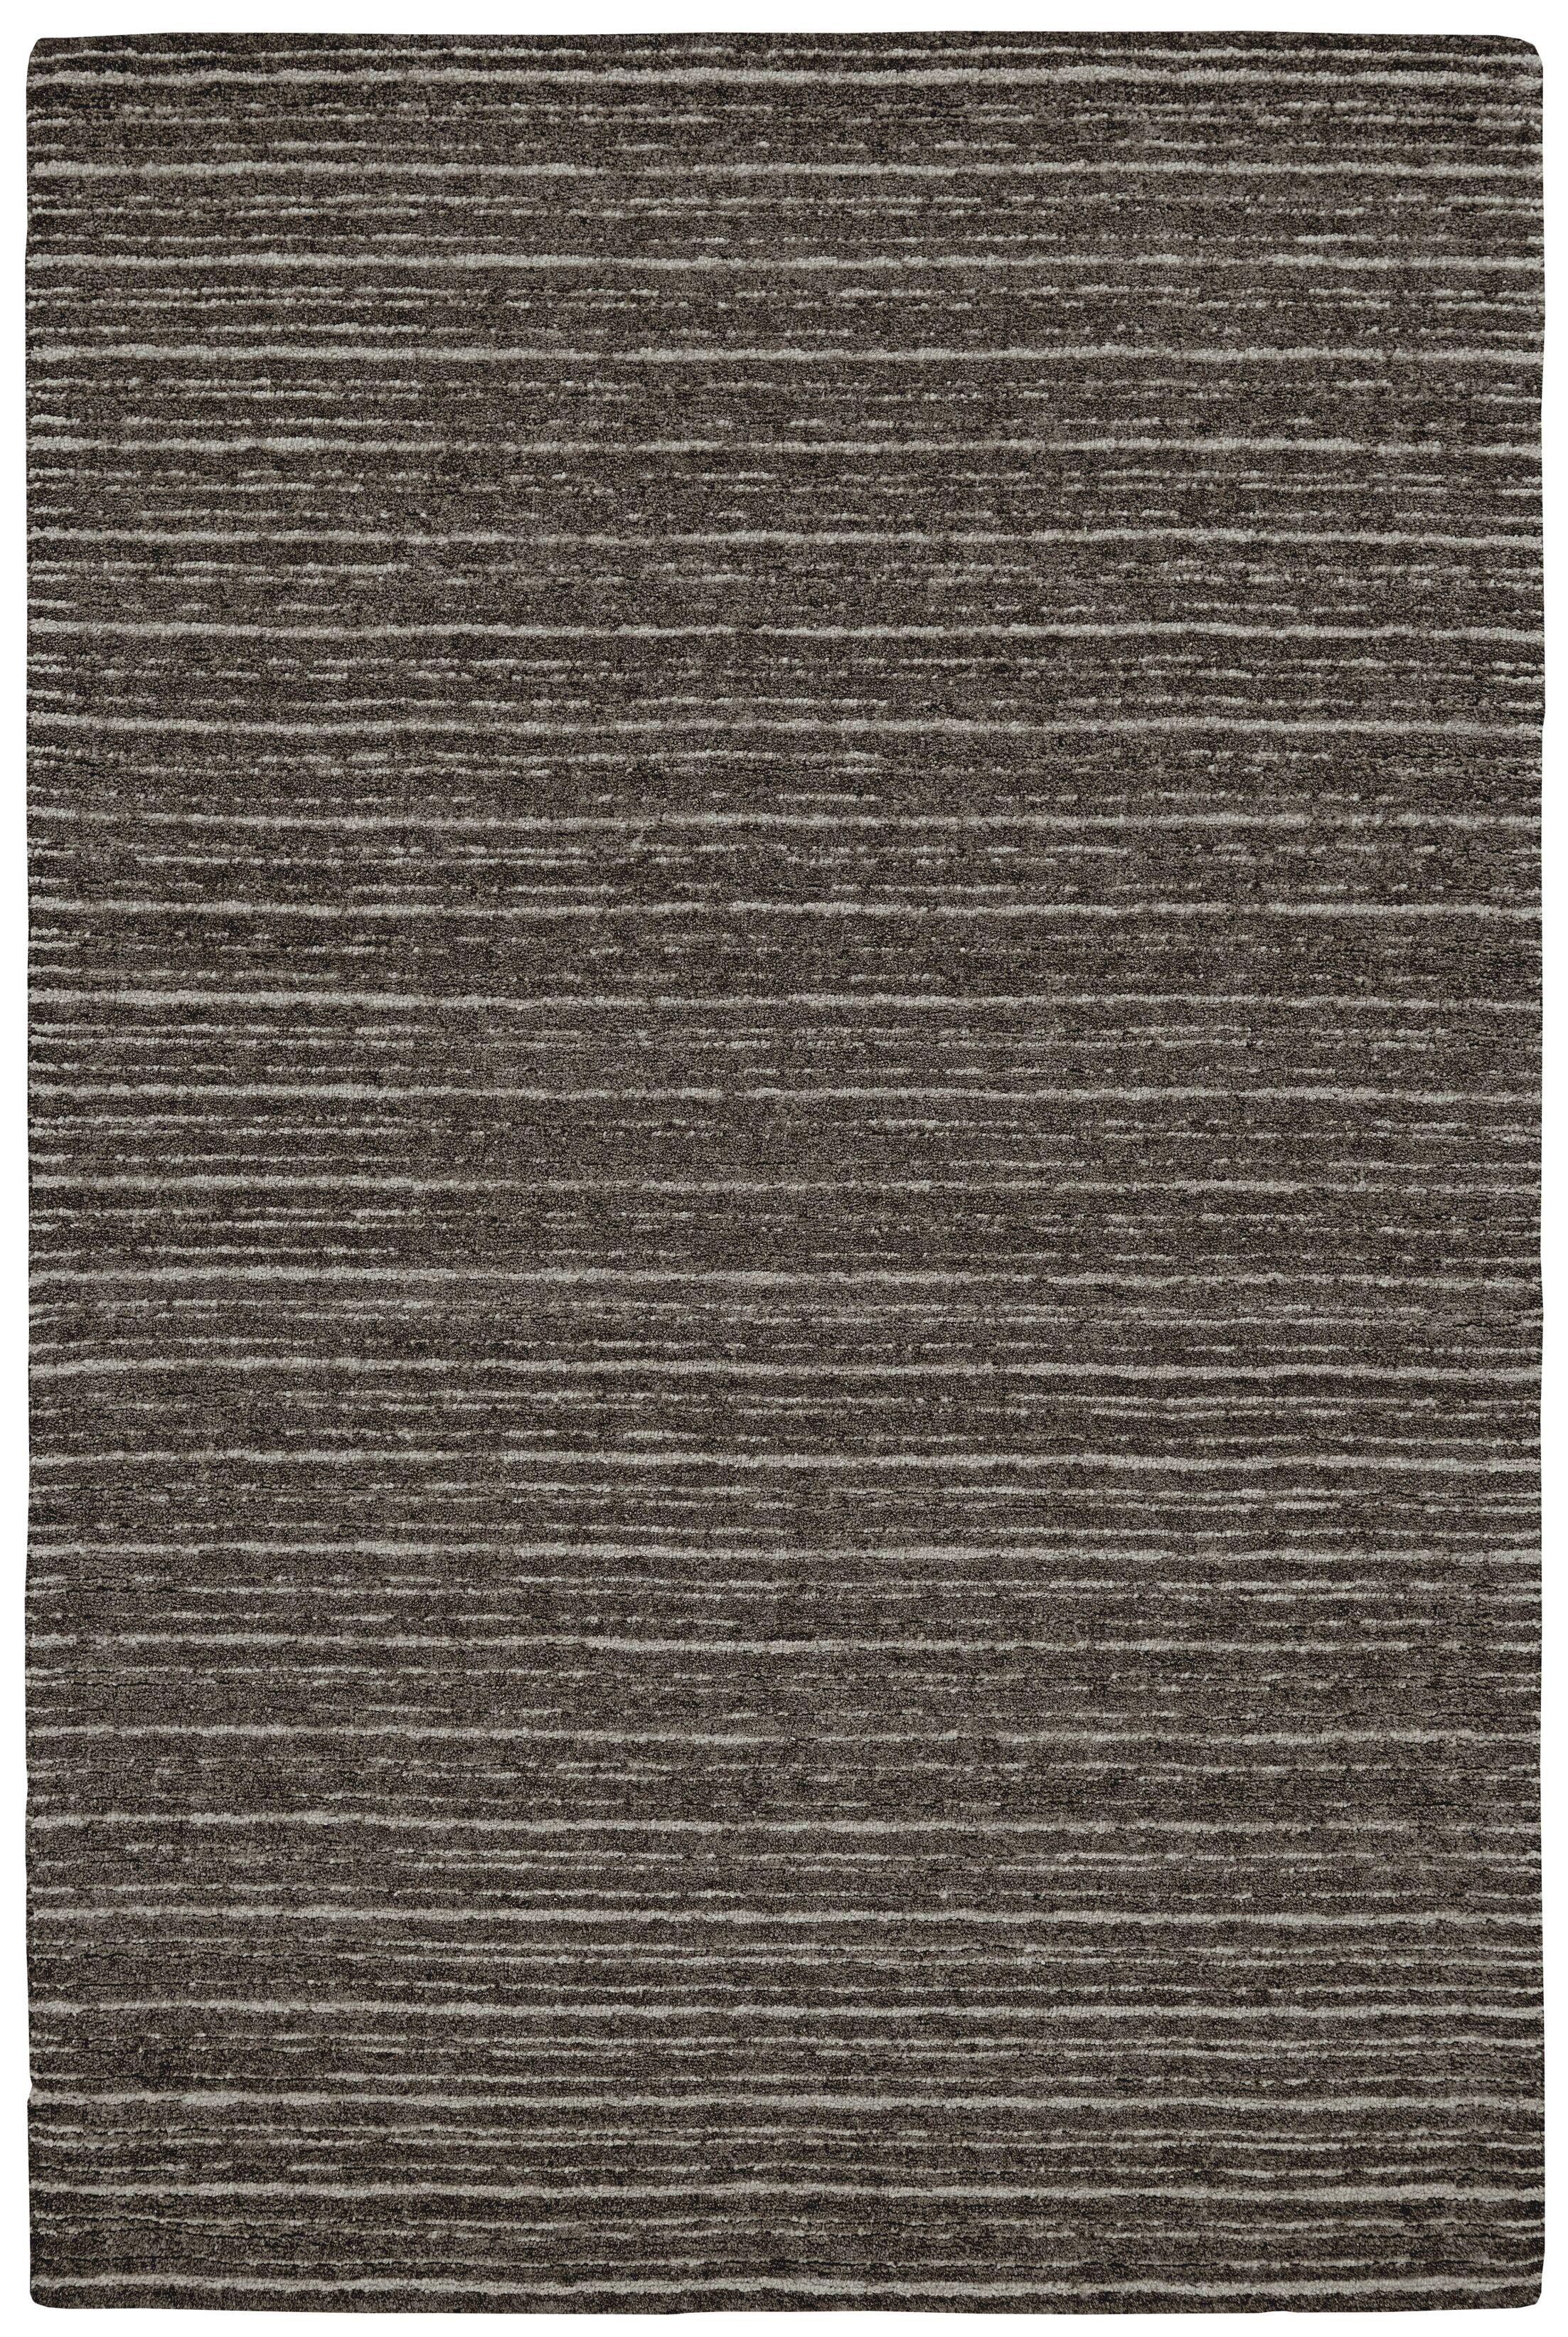 Glenn Hand-Tufted Brown/Gray Area Rug Rug Size: Rectangle 5' x 8'